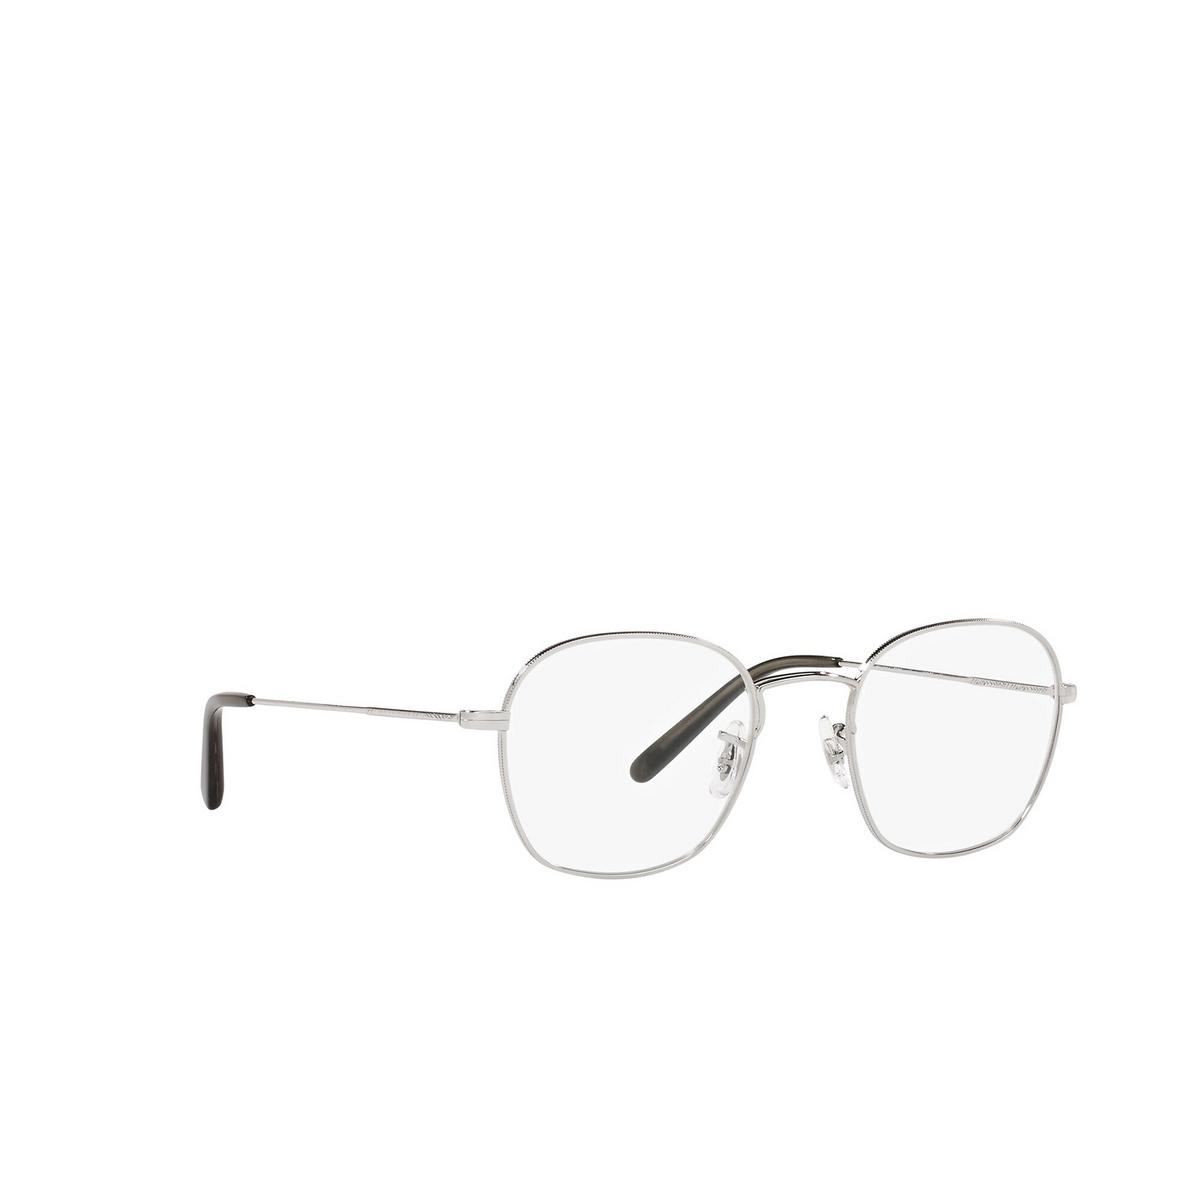 Oliver Peoples® Round Eyeglasses: Allinger OV1284 color Silver 5036 - three-quarters view.